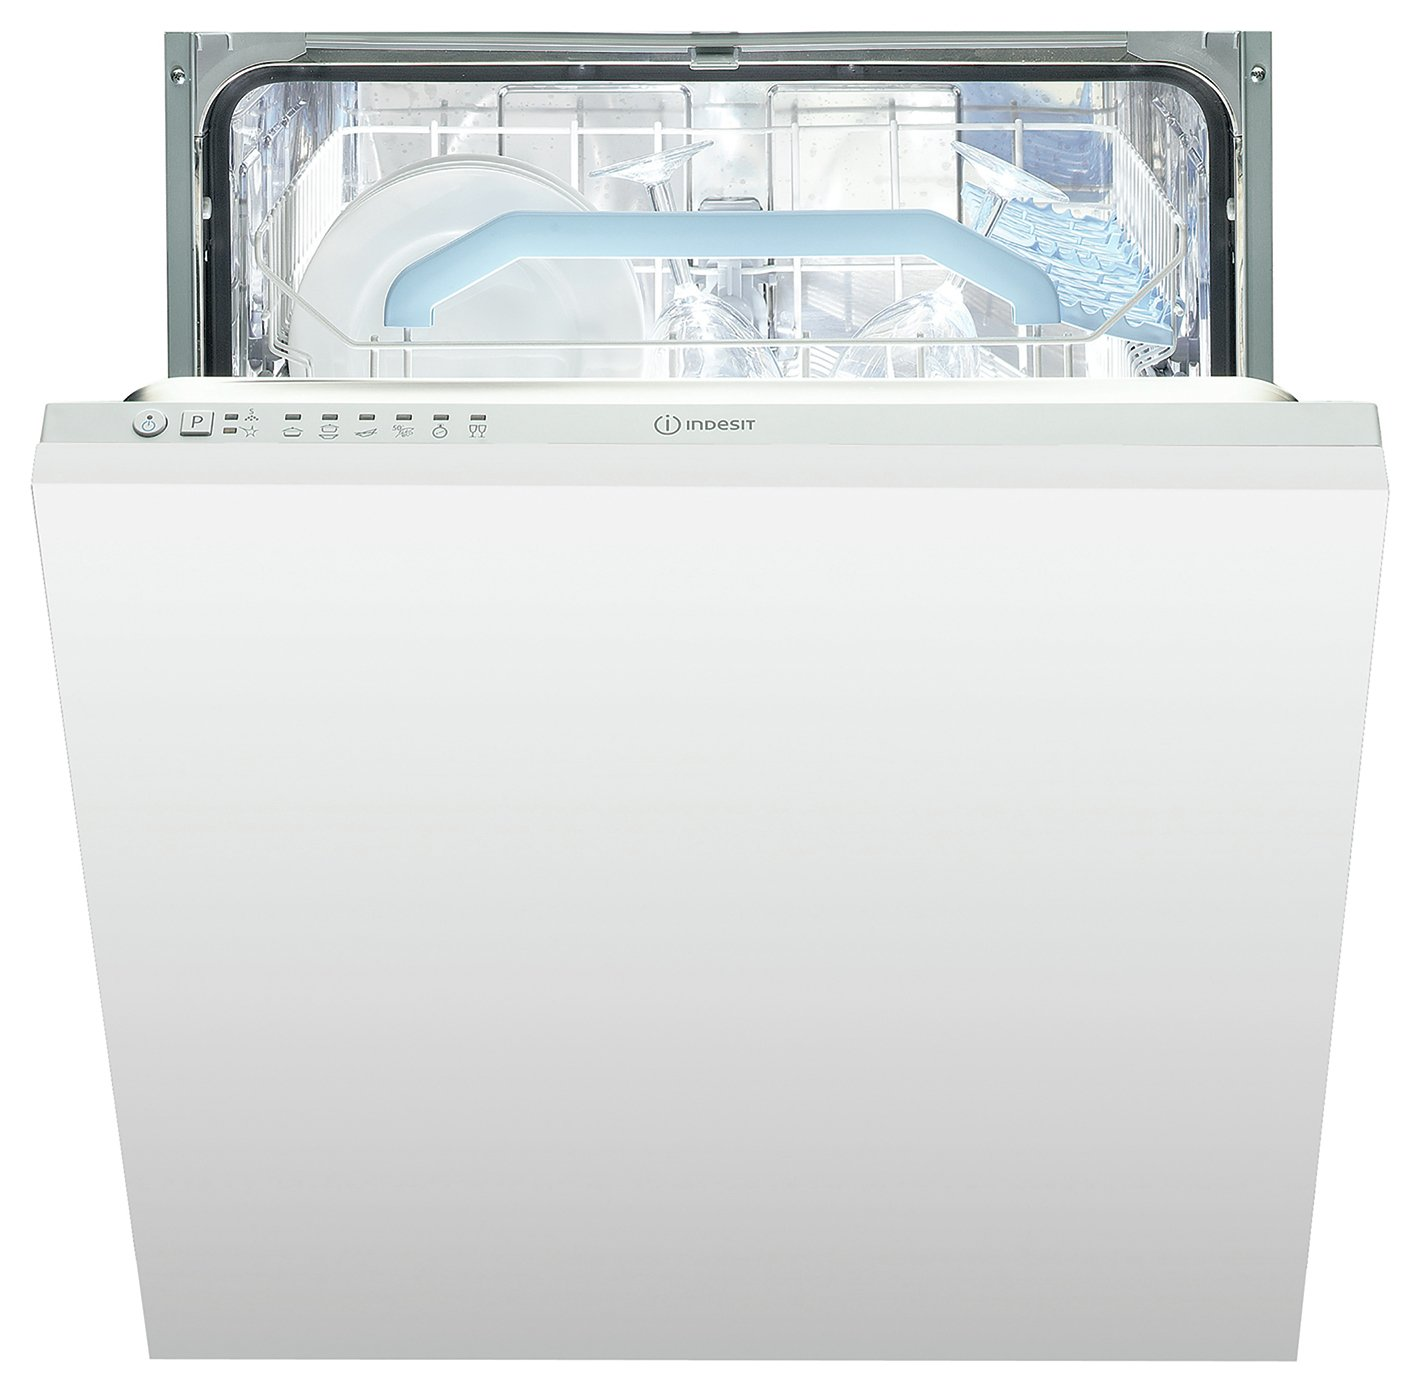 Indesit DIF16B1UK Full Size Integrated Dishwasher - White